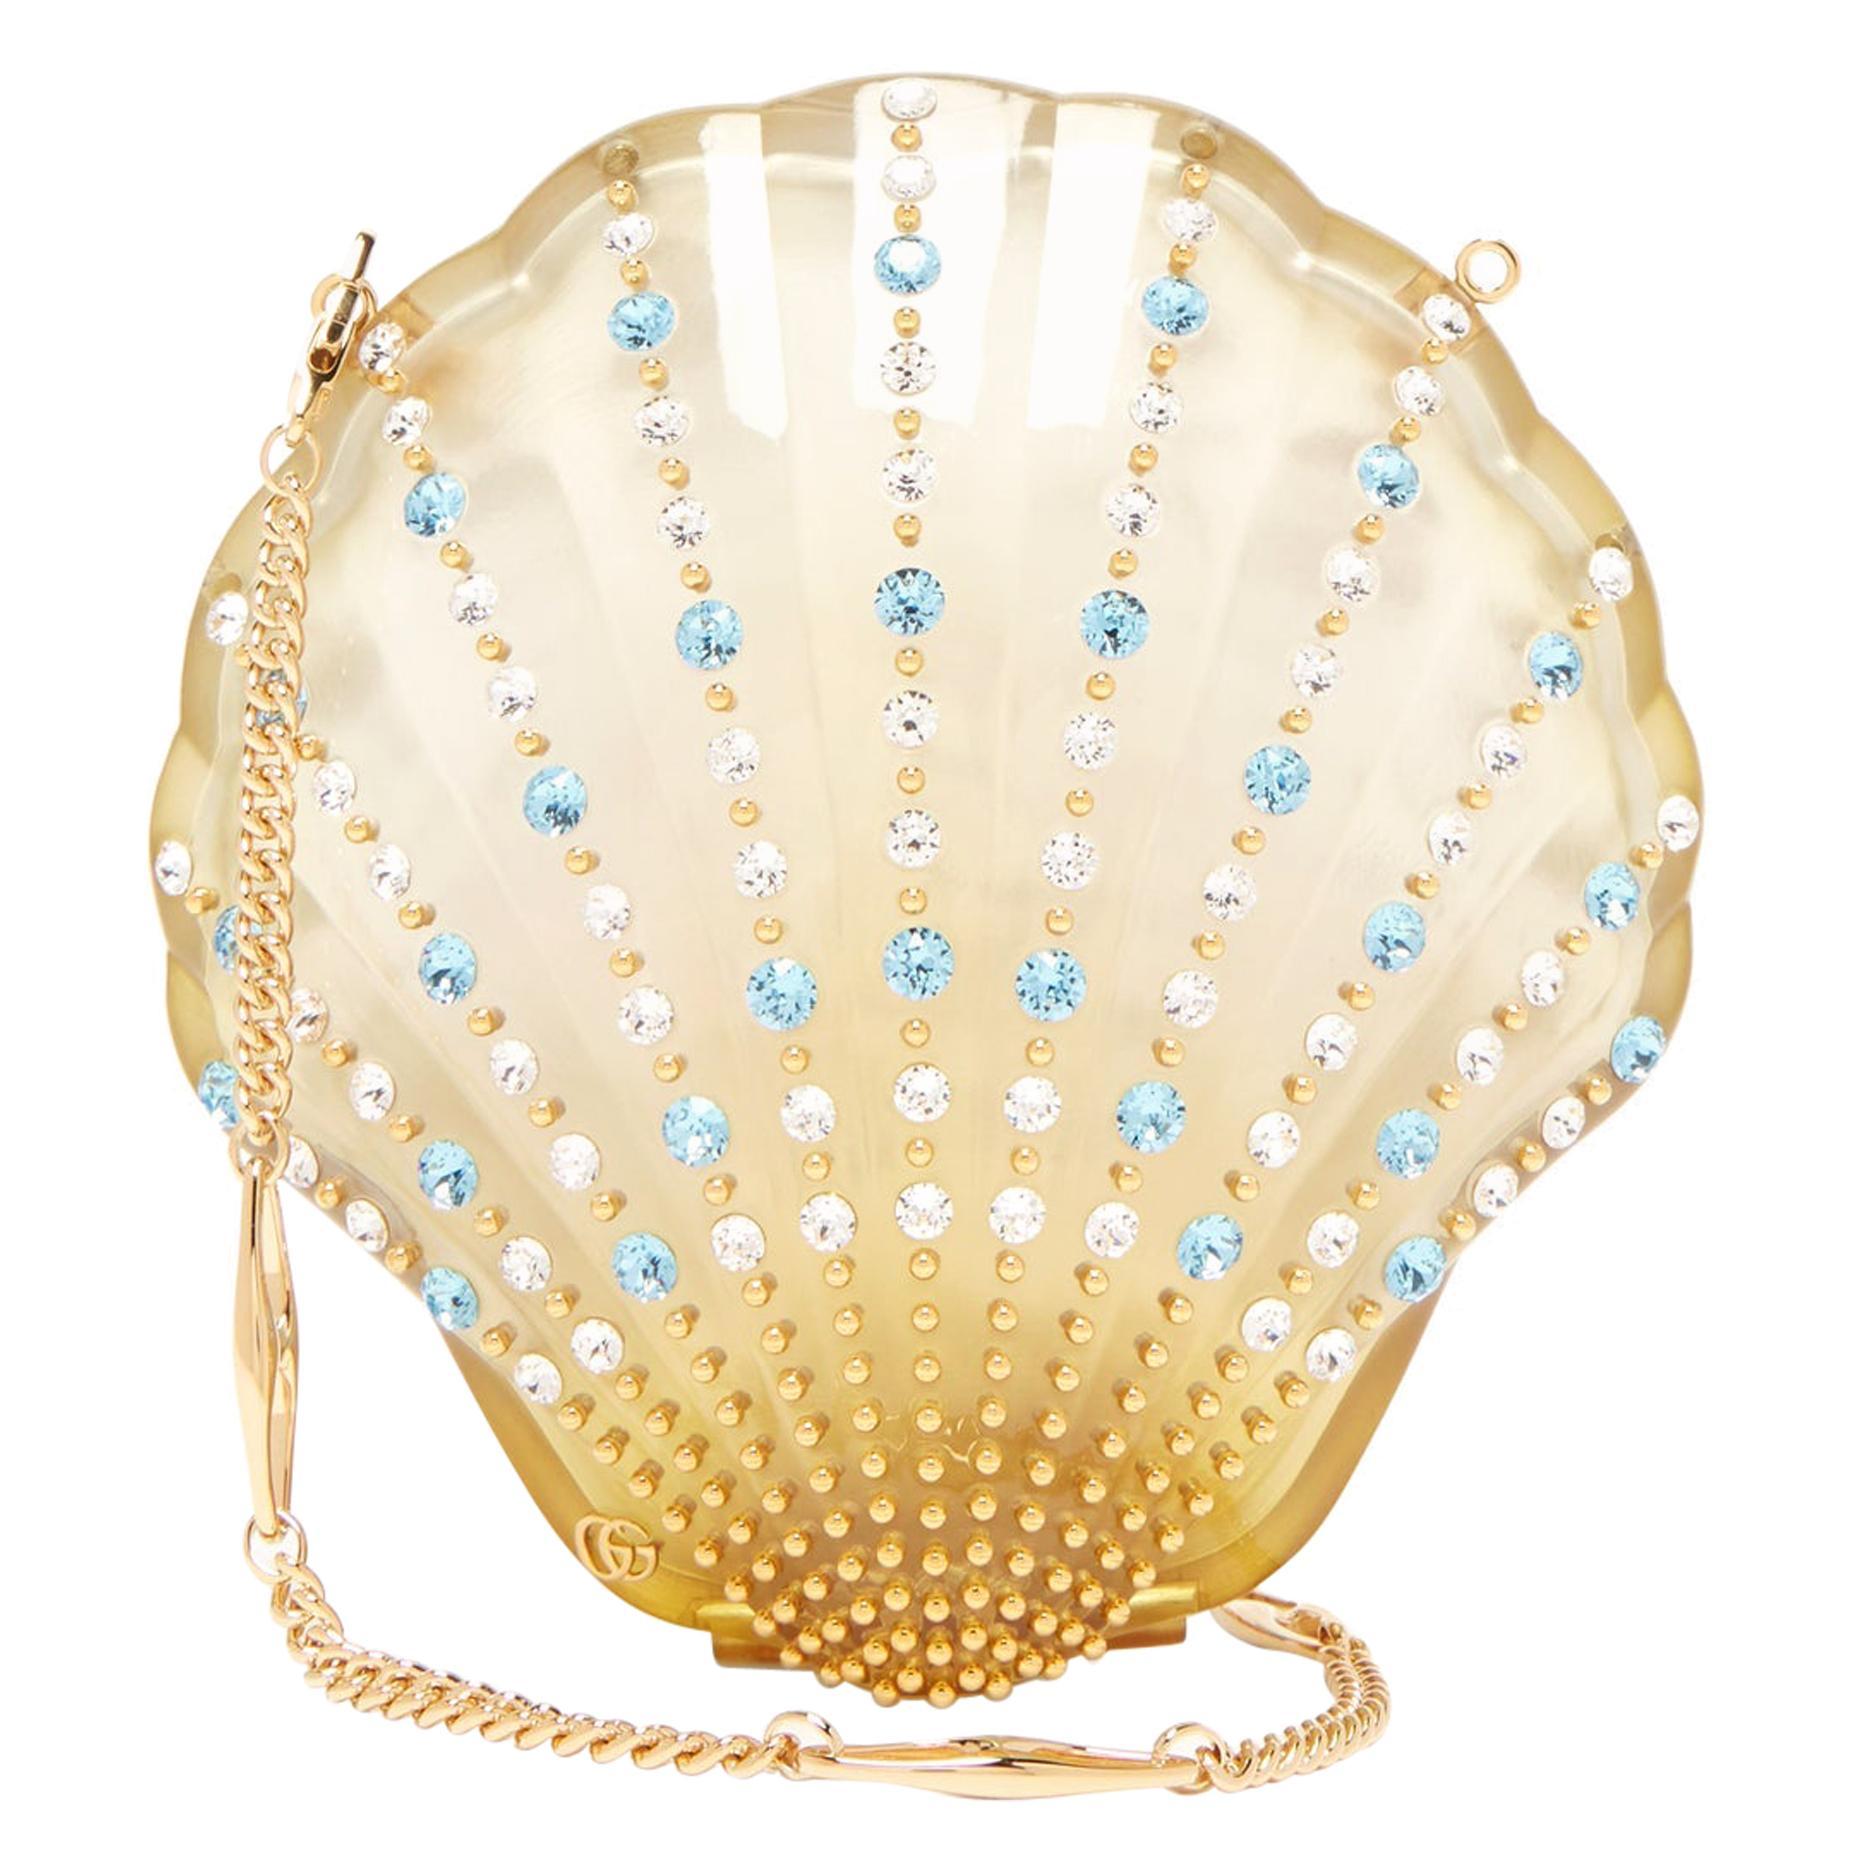 Gucci Crystal Blue Sea Shell Gold Kisslock Logo Evening Shoulder Clutch Bag